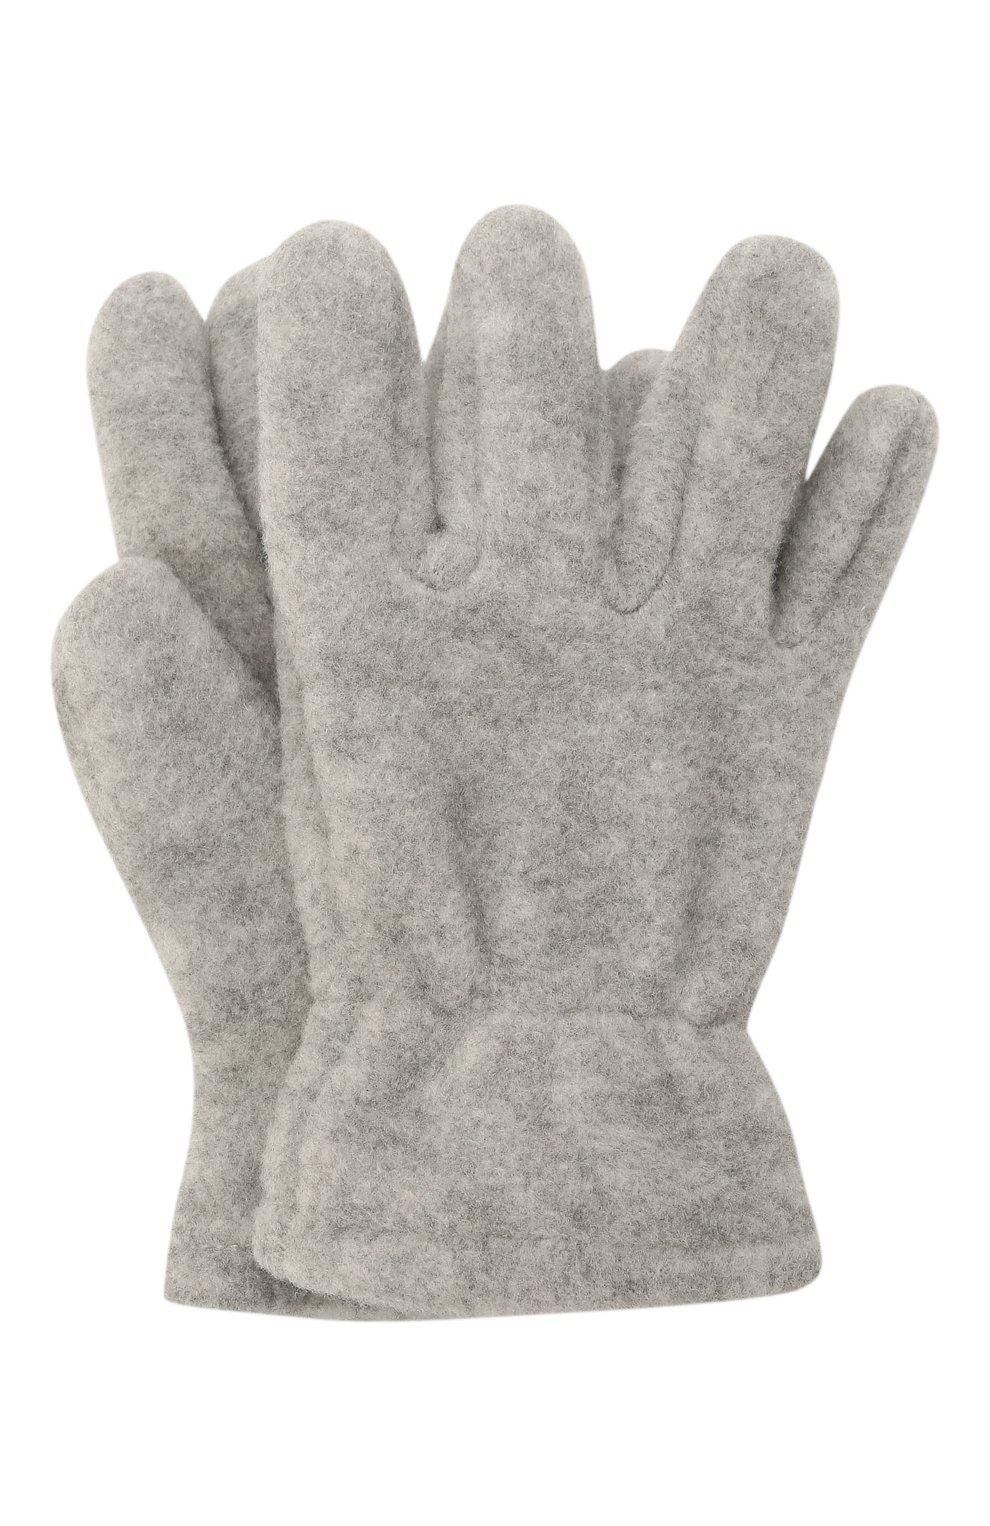 Детские перчатки CATYA серого цвета, арт. 125543 | Фото 1 (Материал: Текстиль, Синтетический материал)